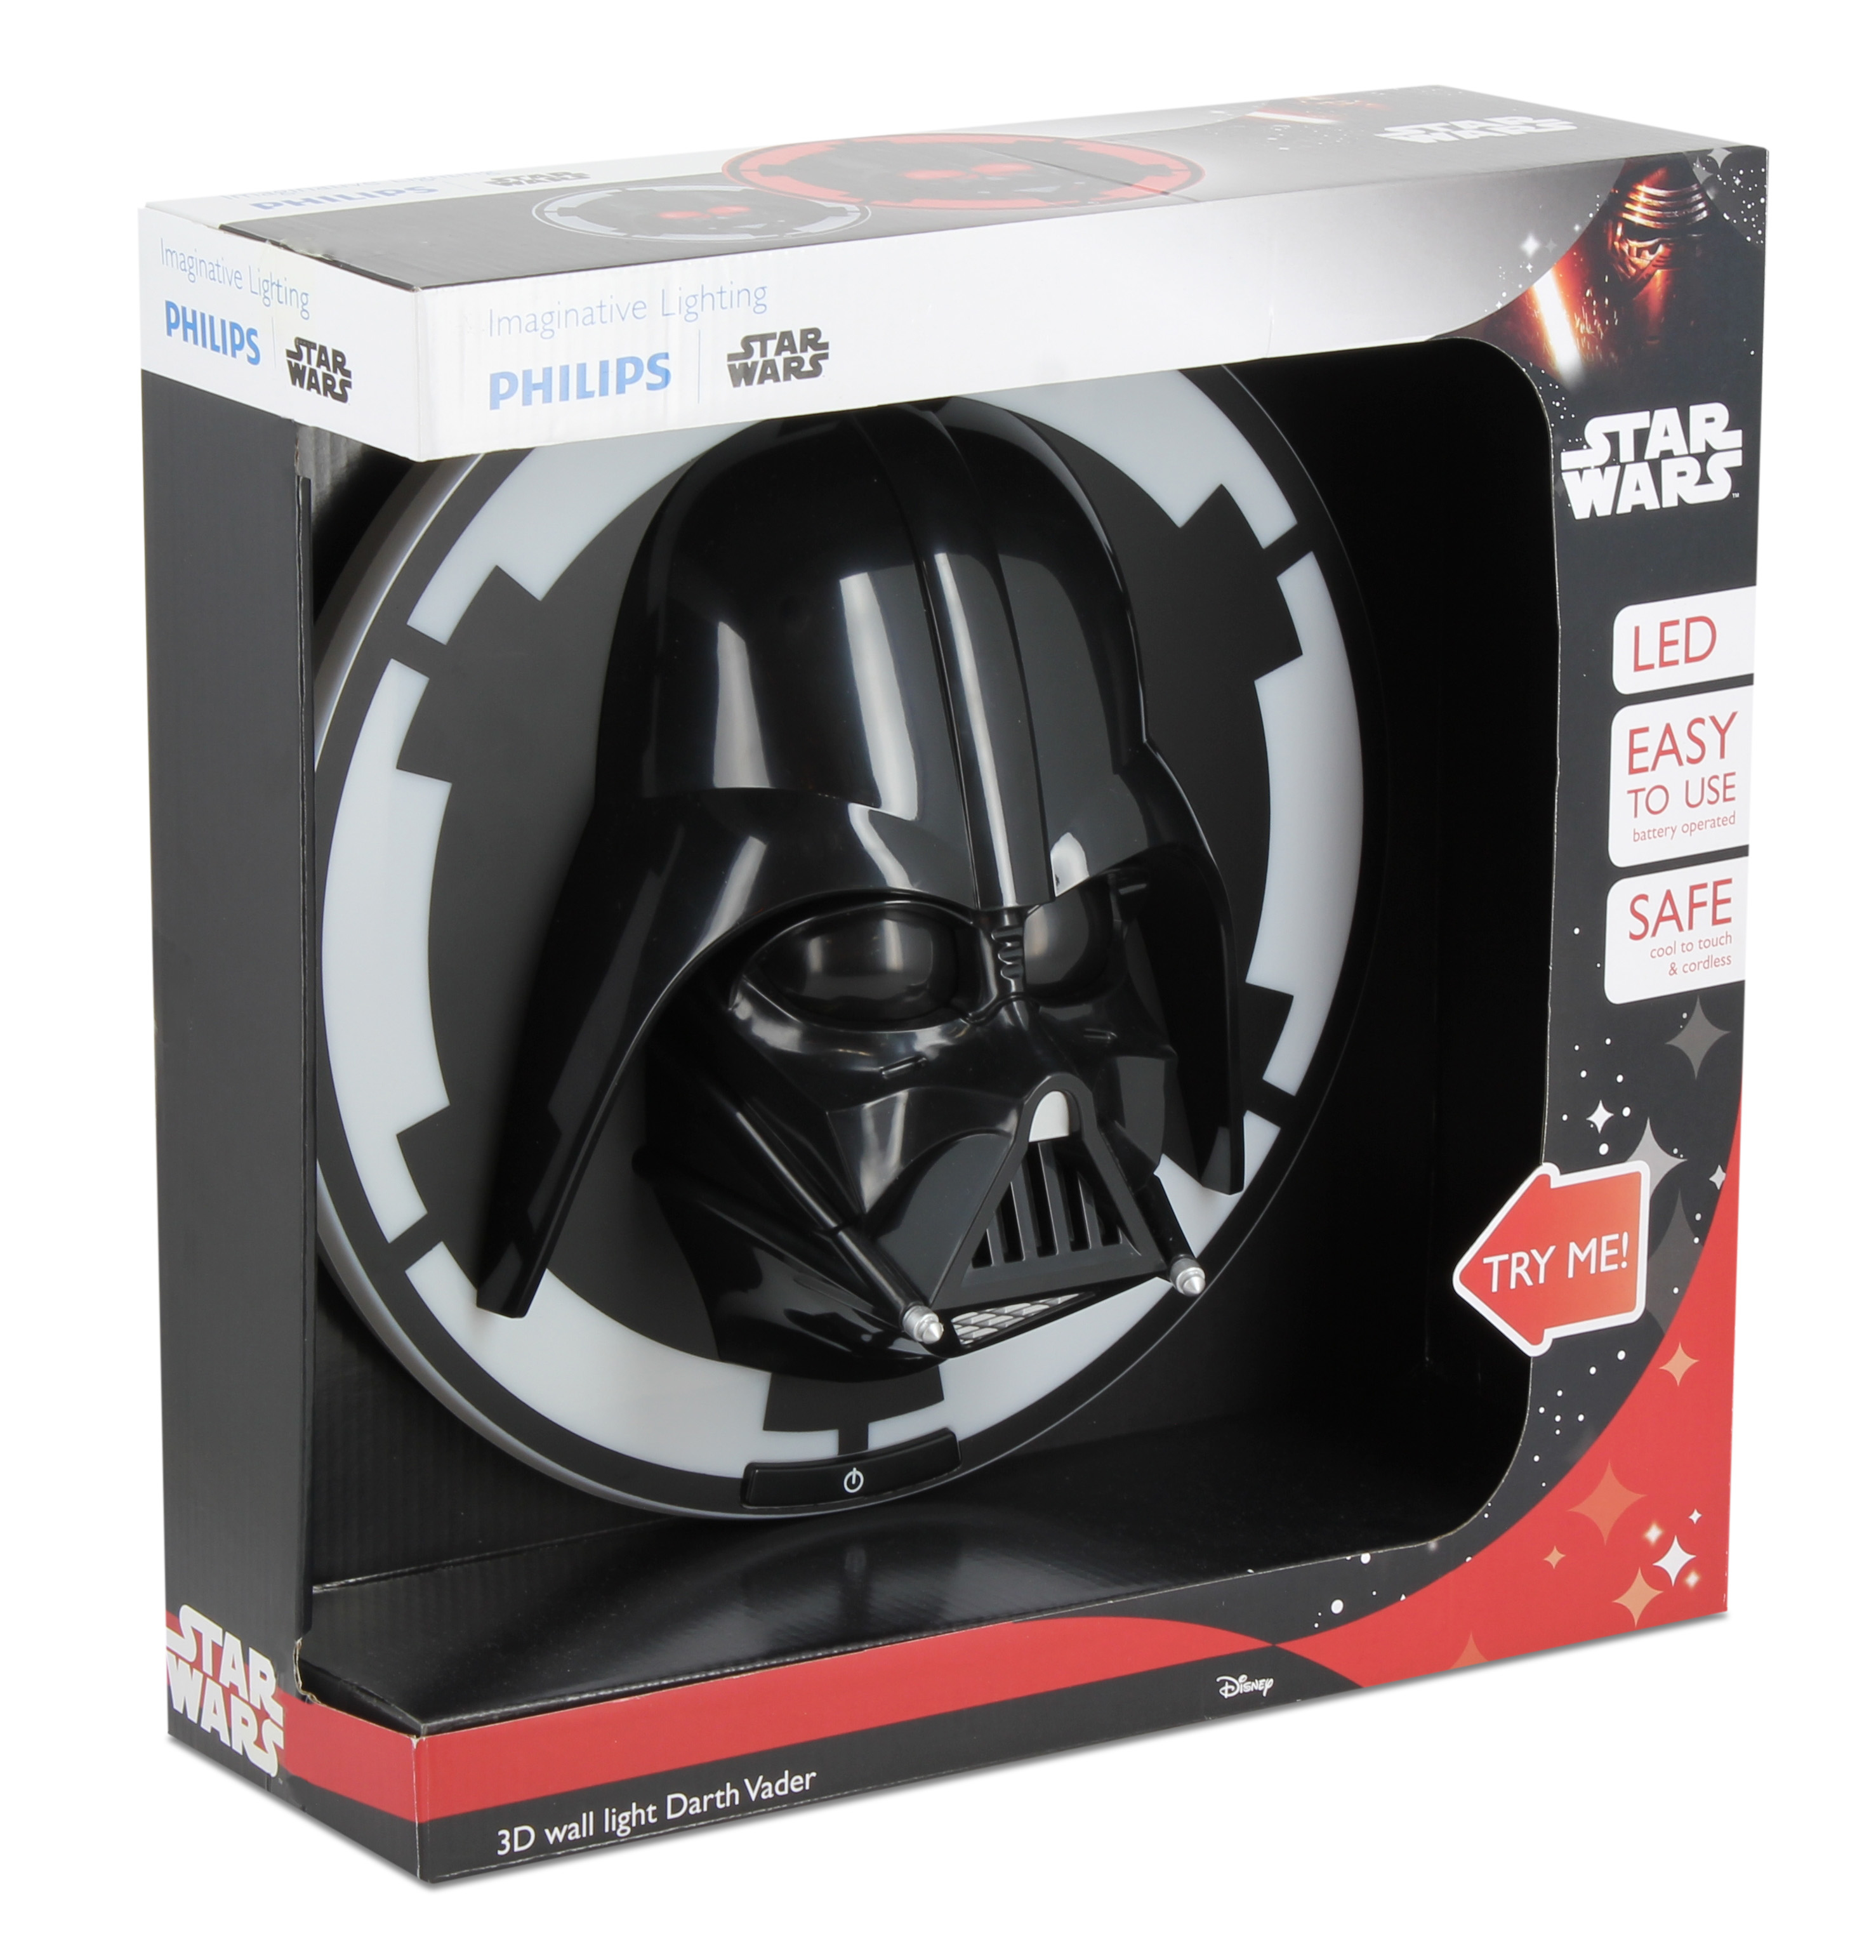 Philips Murale Darth Vader 3d Star Led Lampe Wars QdCrhts